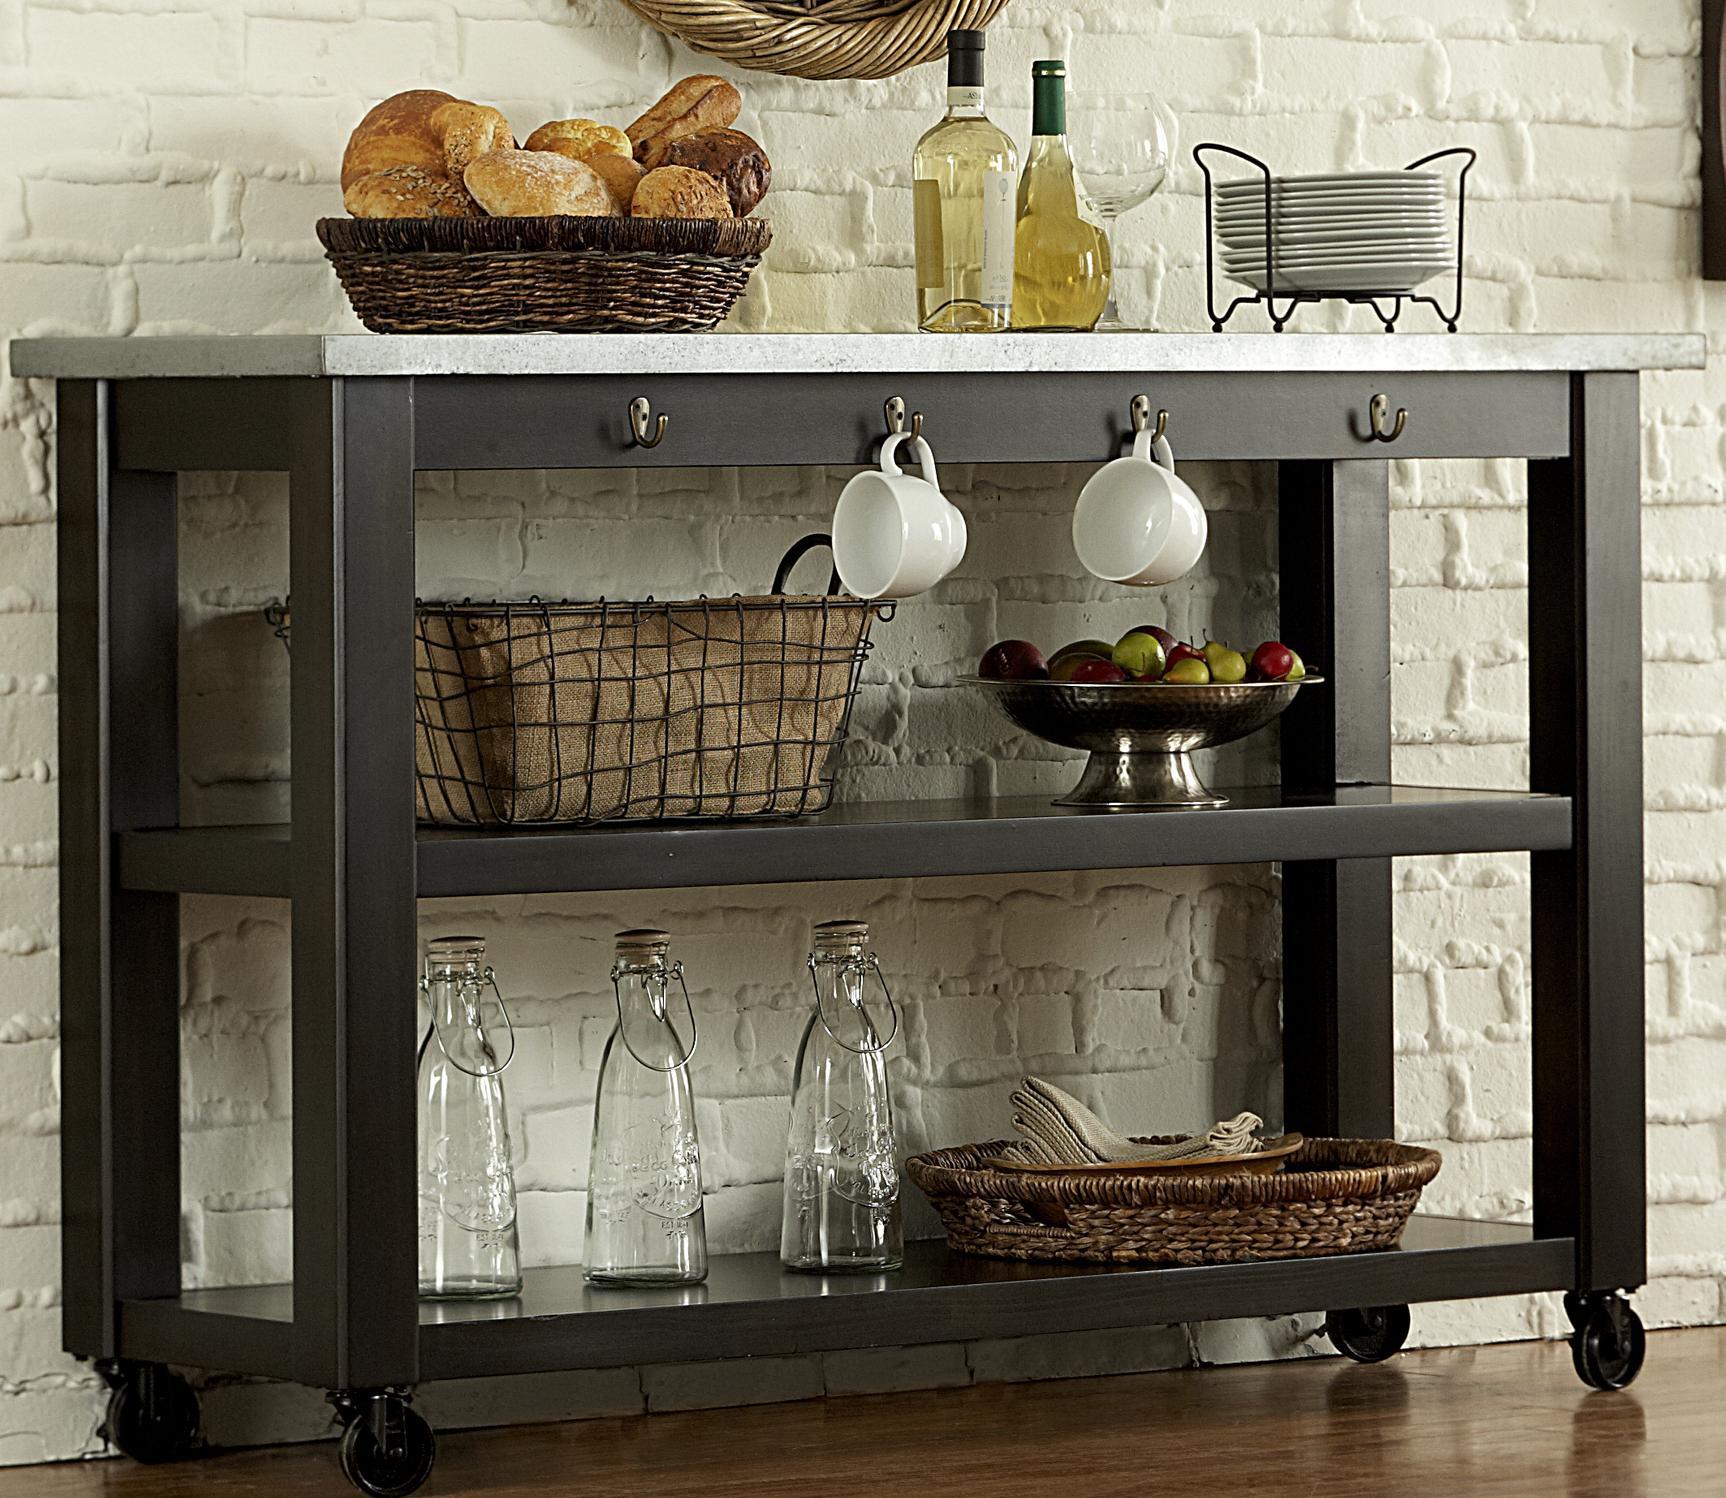 Keaton II Kitchen Server by Liberty Furniture at Lapeer Furniture & Mattress Center